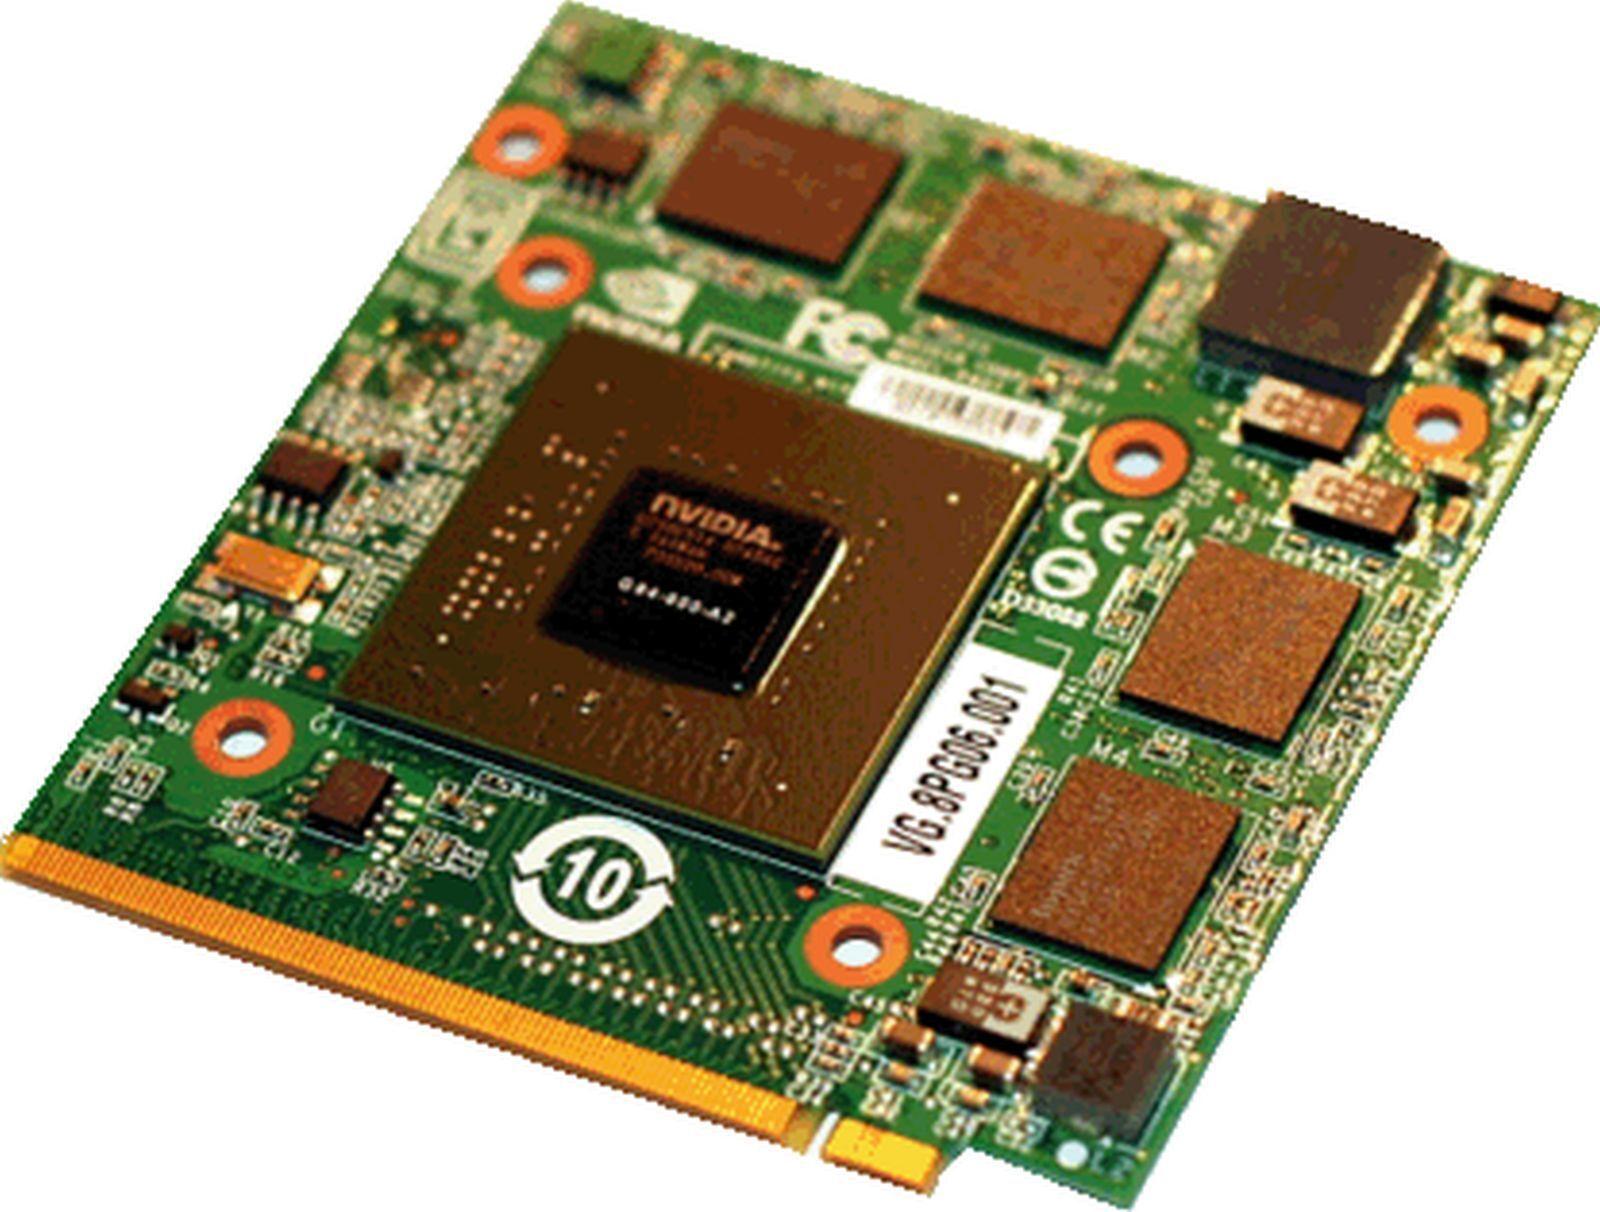 NVIDIA GeForce 8600m GT VGA Grafikkarte Reparatur ( für Acer Aspire 7720 7720G )